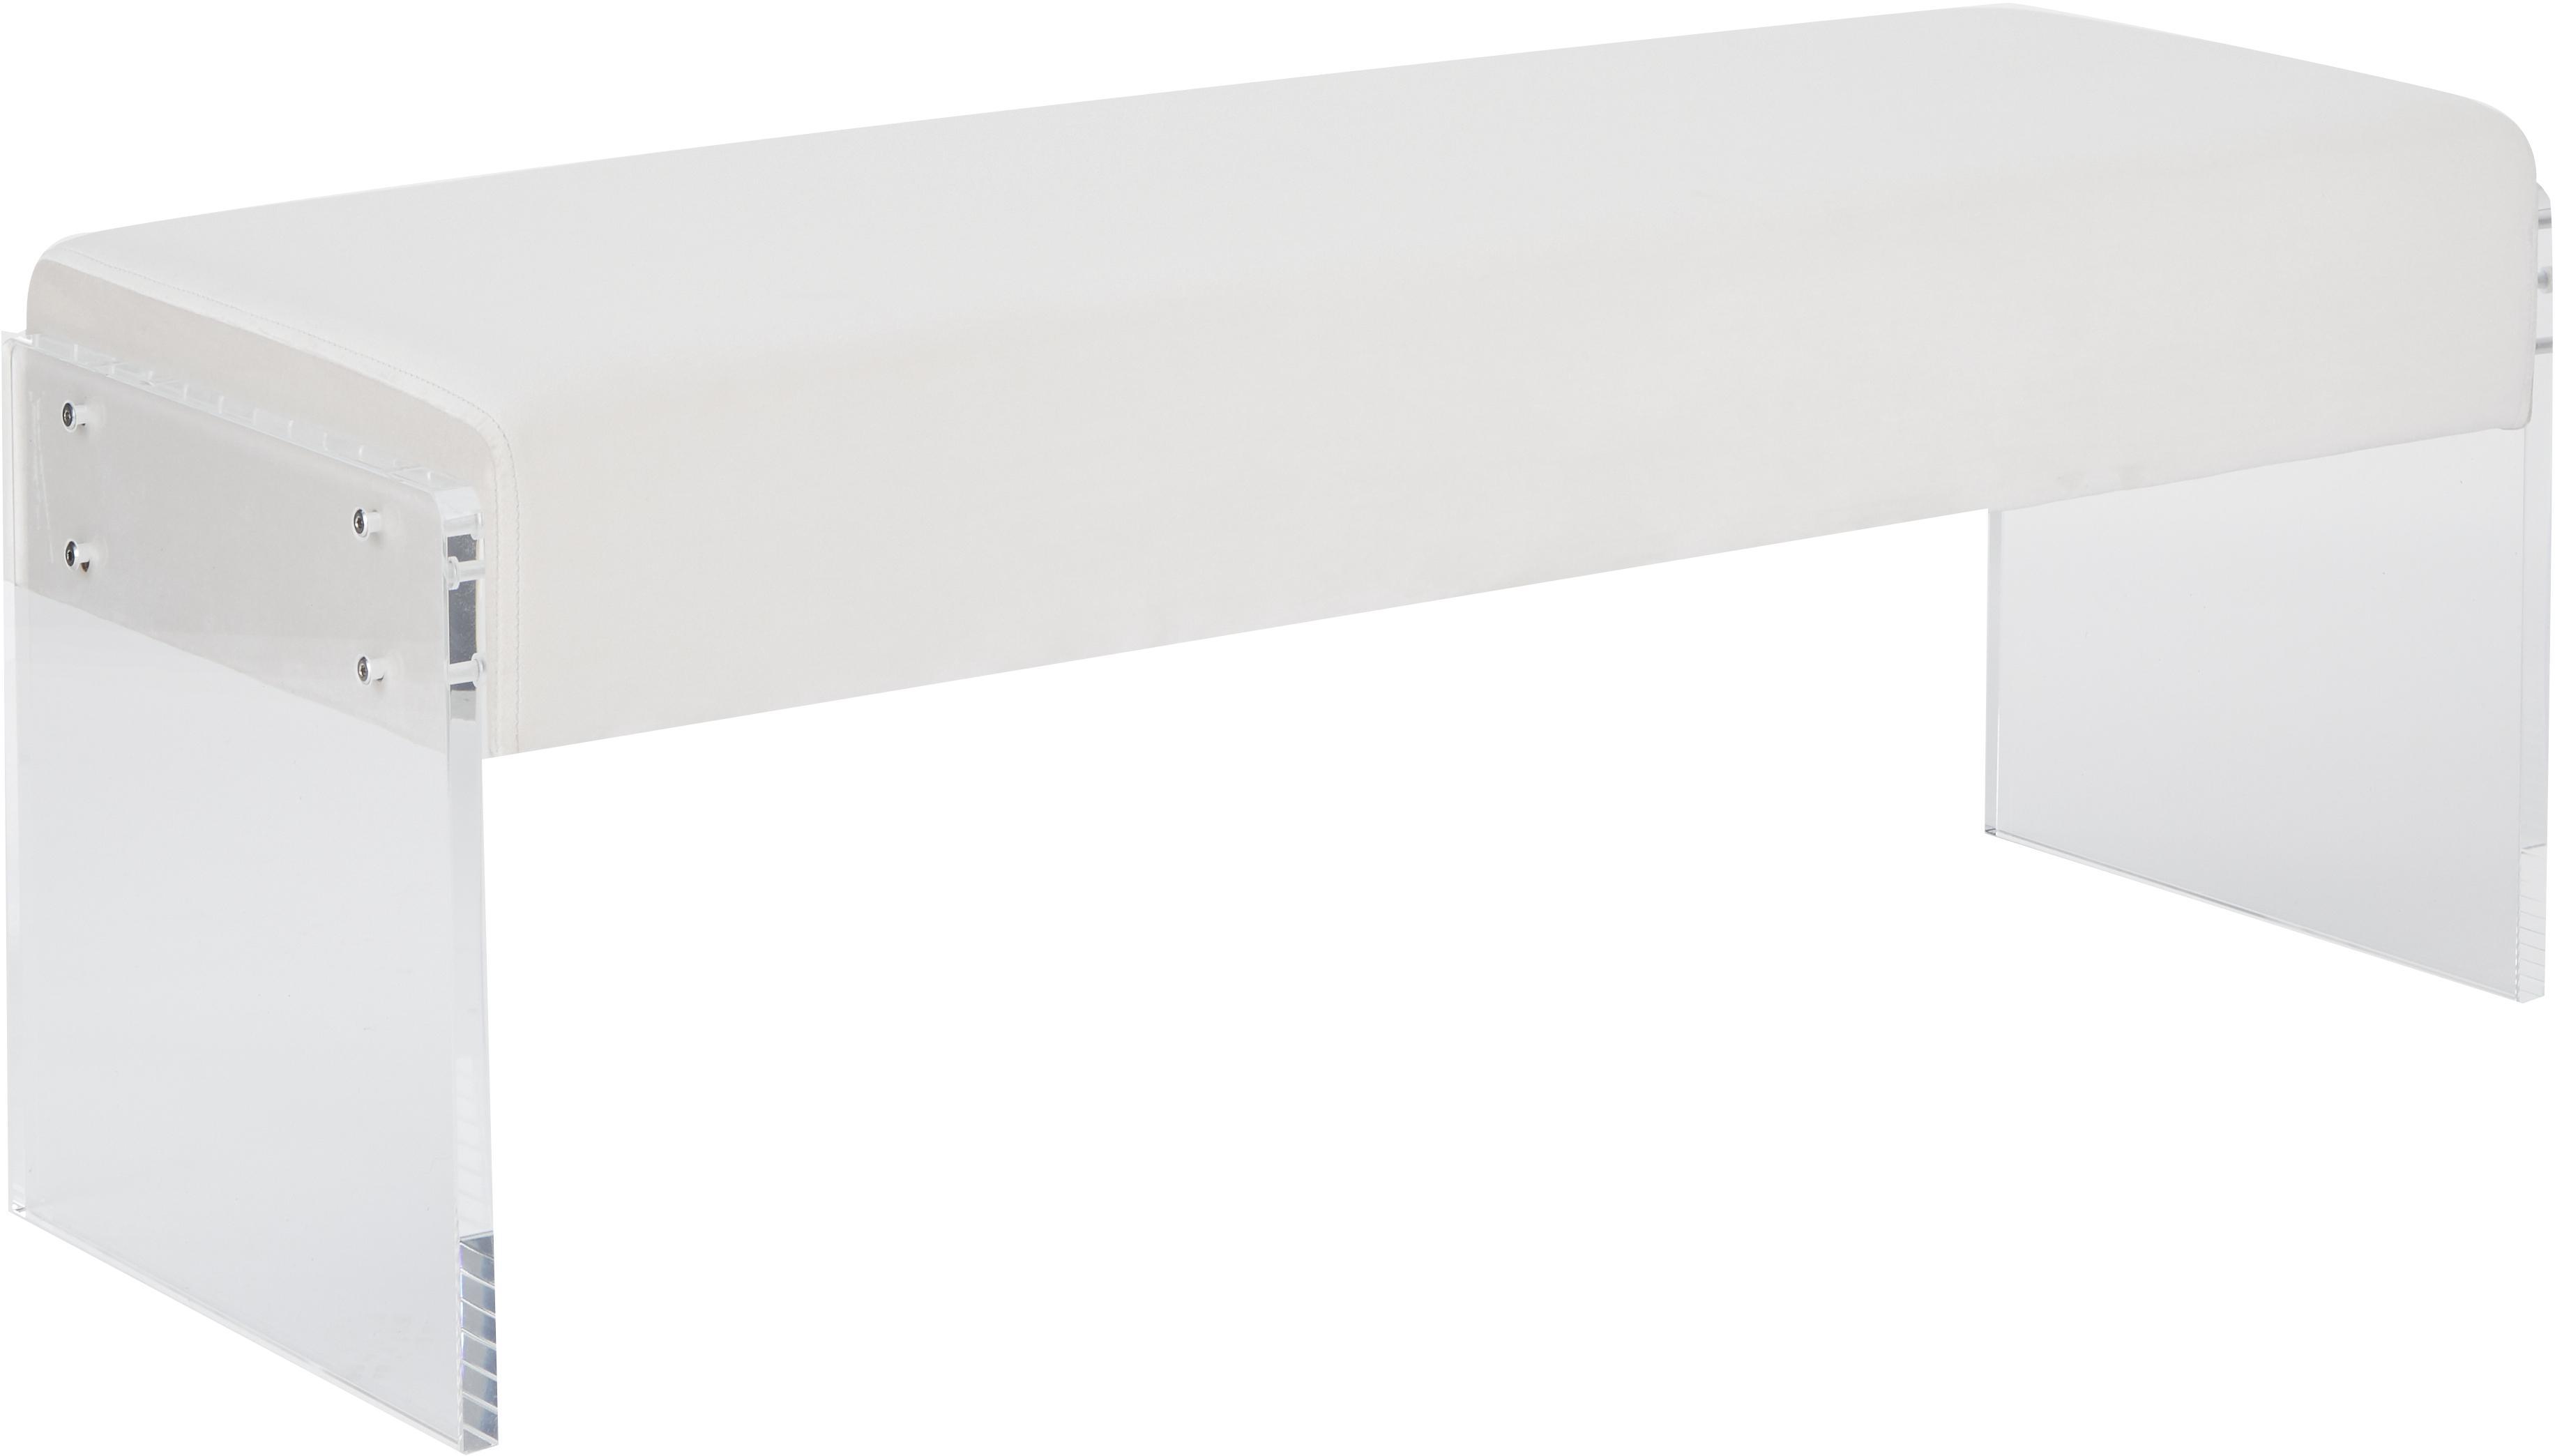 Banco de terciopelo Ayden, Tapizado: terciopelo (poliéster) 25, Patas: vidrio acrílico, Beige, transparente, An 116 x Al 43 cm